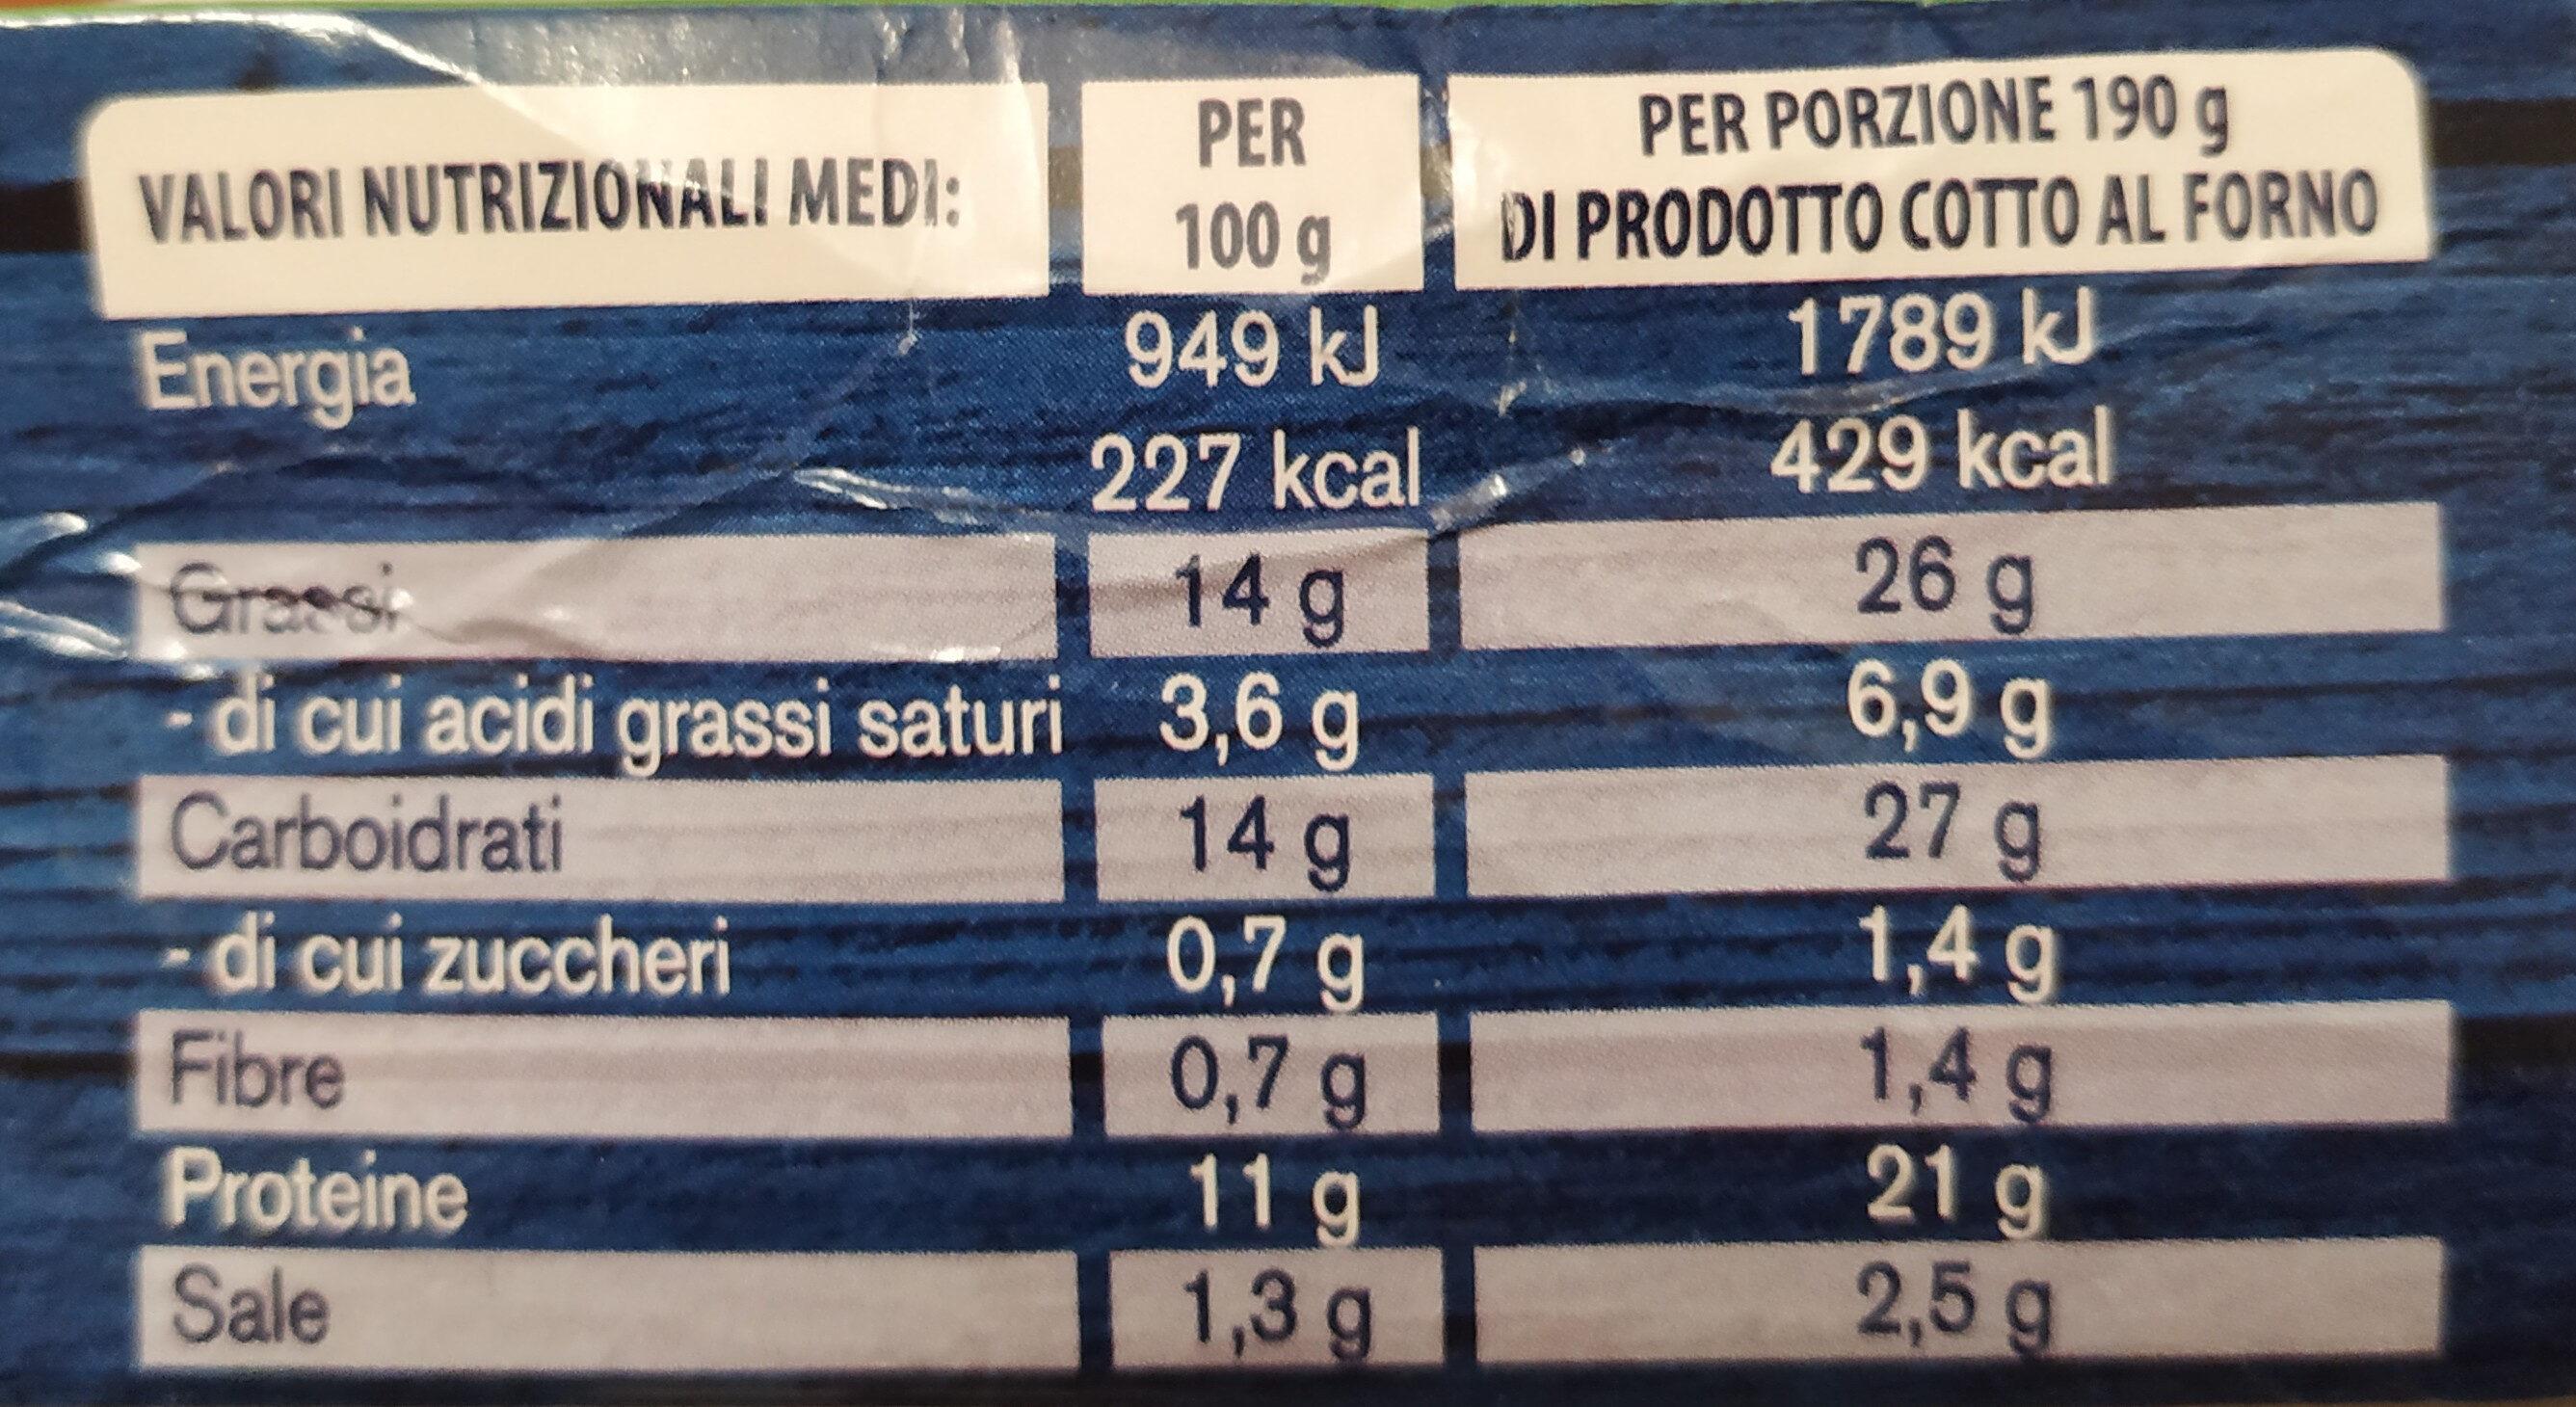 I gratinati merluzzo d'Alaska con erbe mediterranee - Informations nutritionnelles - it